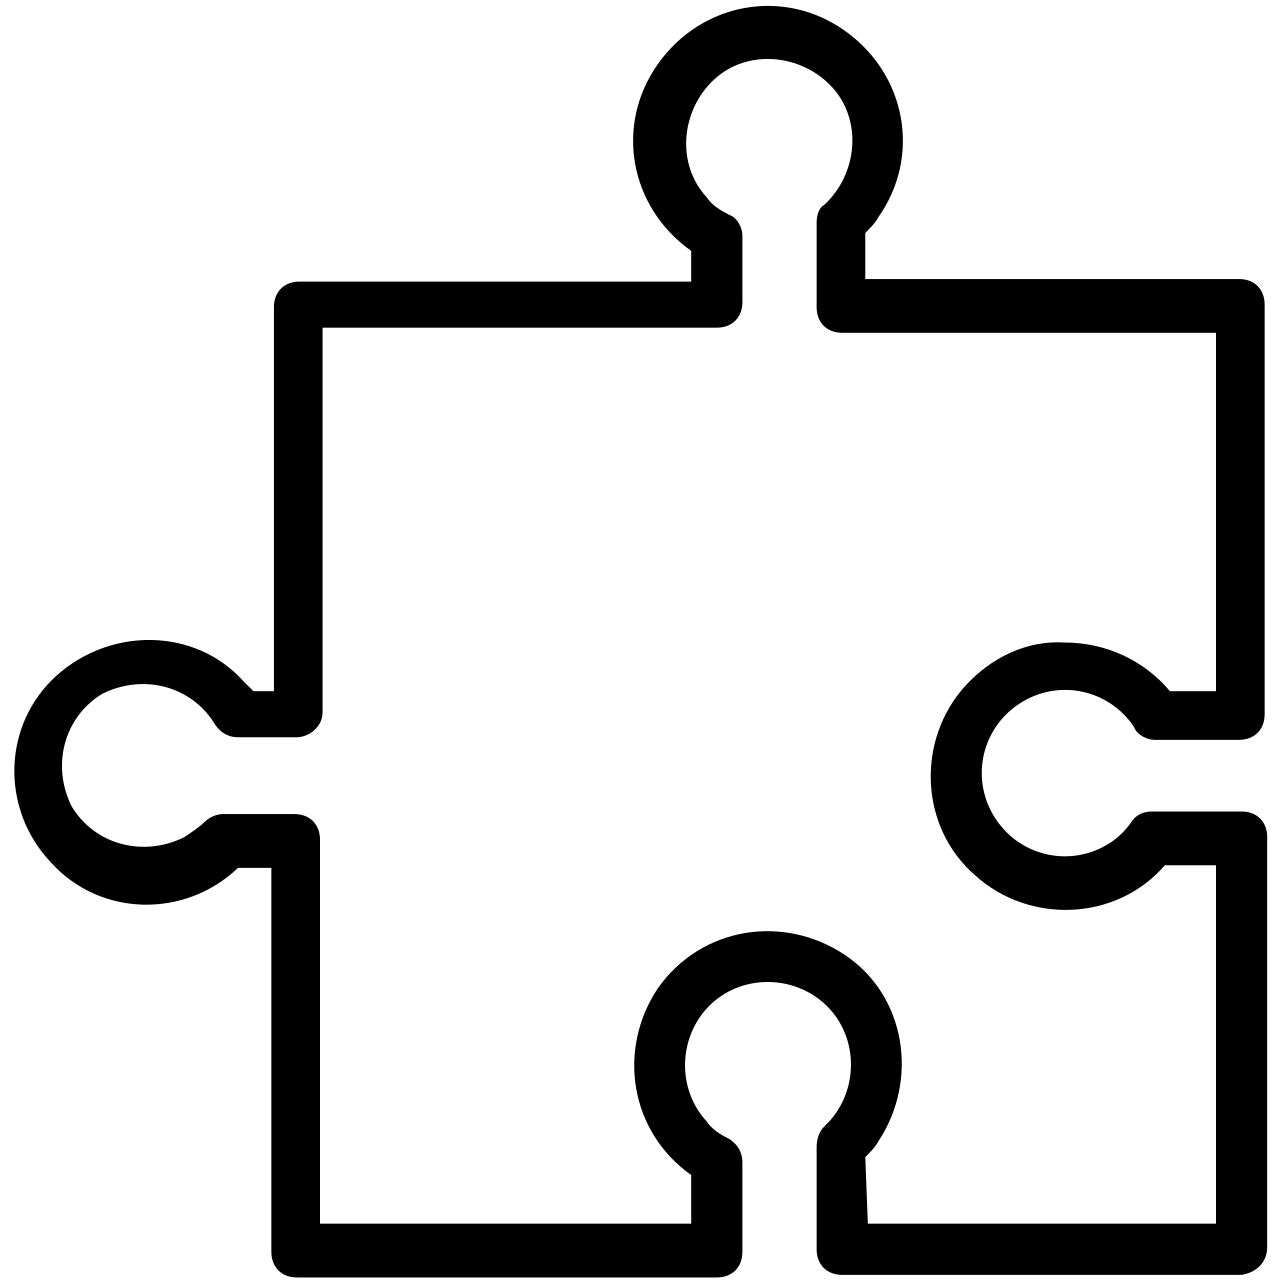 a-perfect-match-compatibility-black-50x50